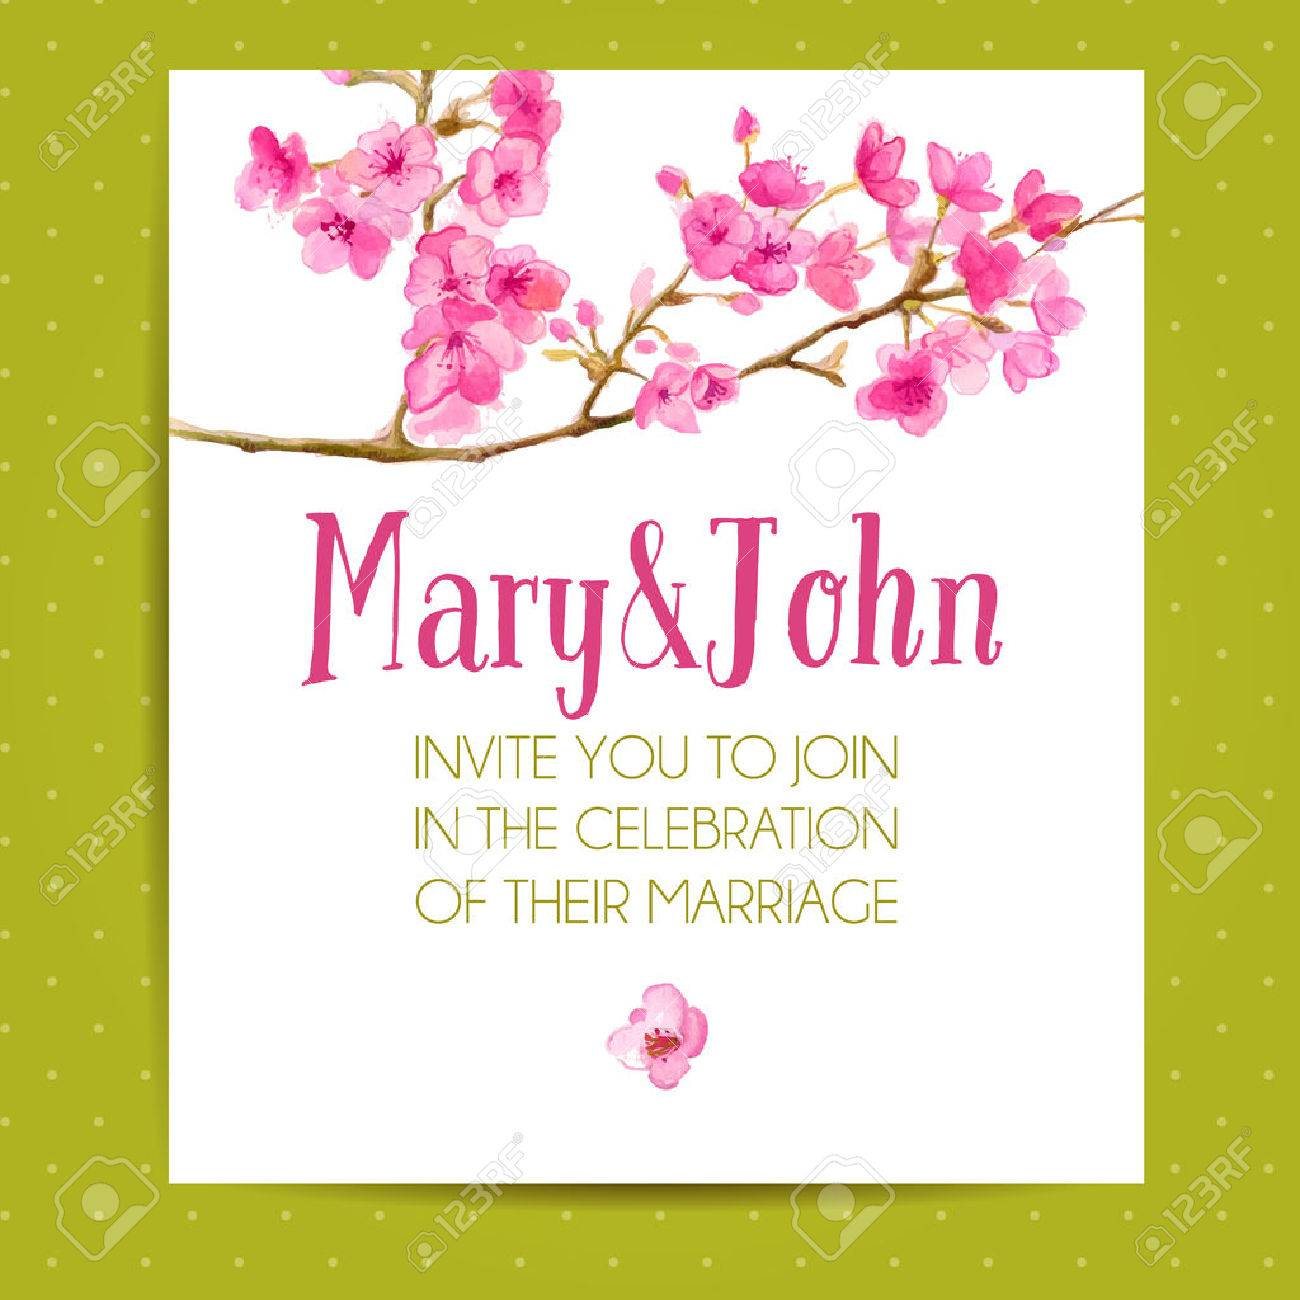 Wedding Invitation Layout With Sakura Flowers. Vector Template ...